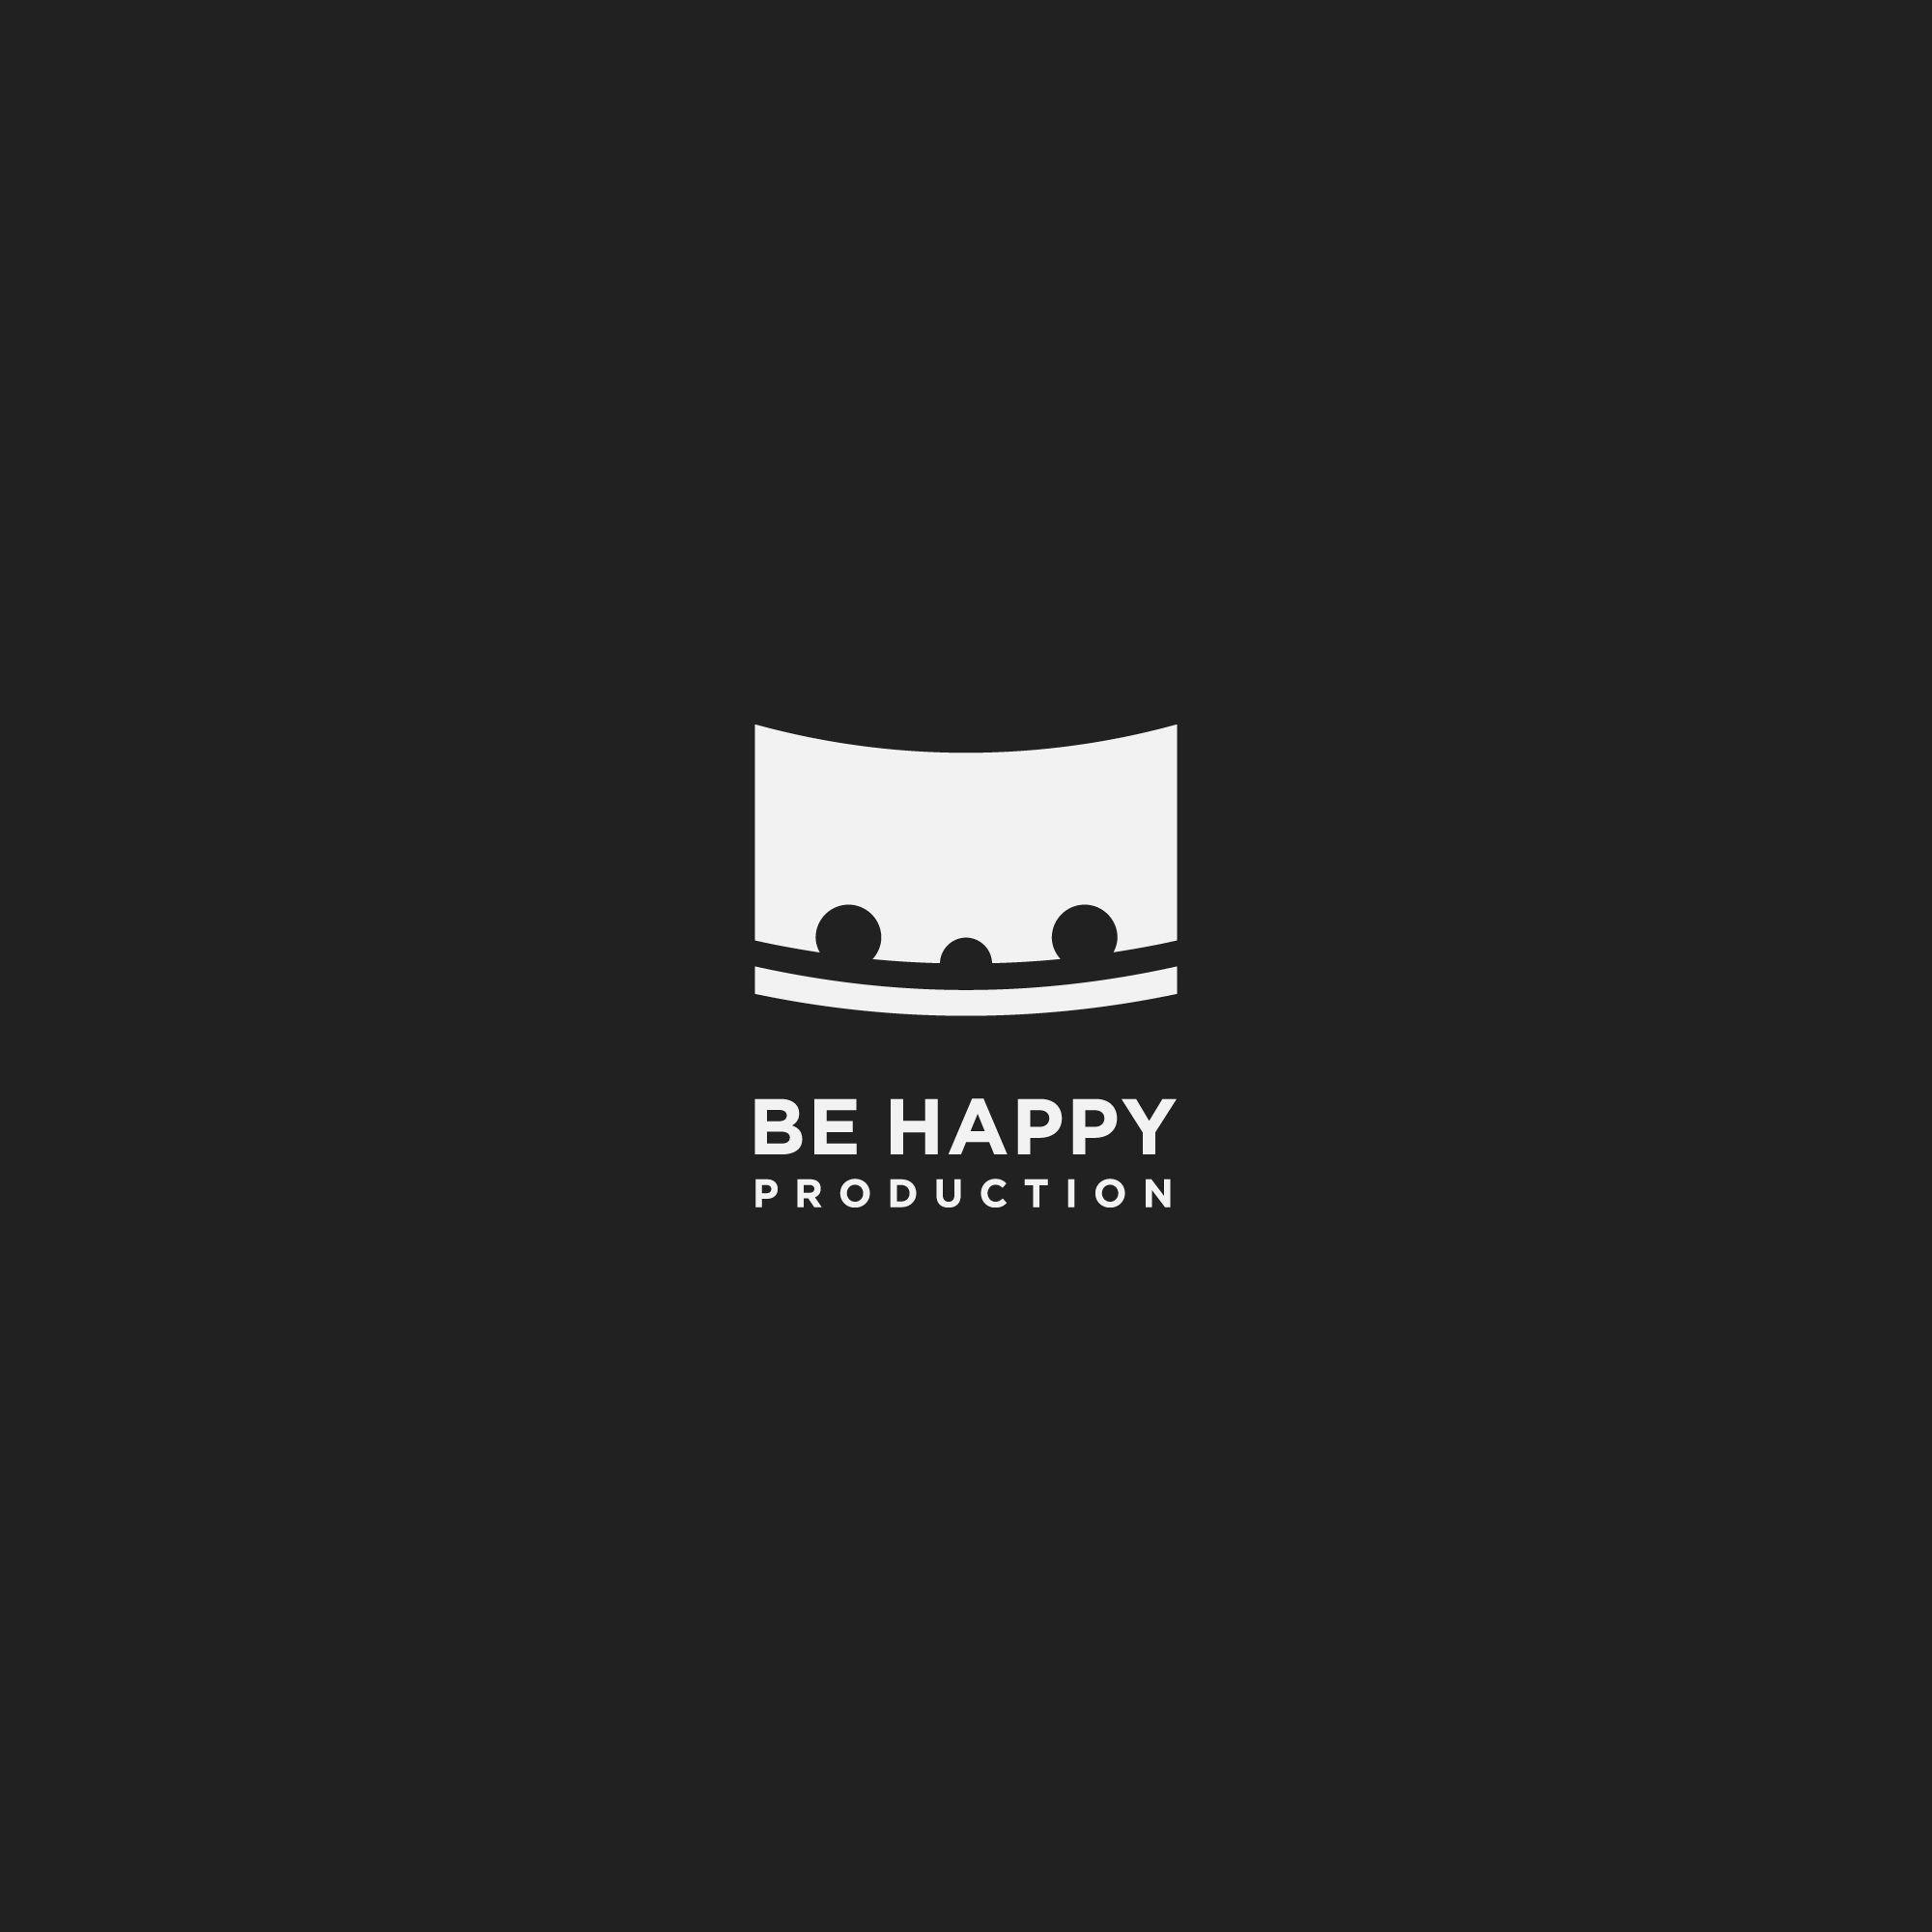 Логотип для Be Happy Production  - дизайнер SANITARLESA